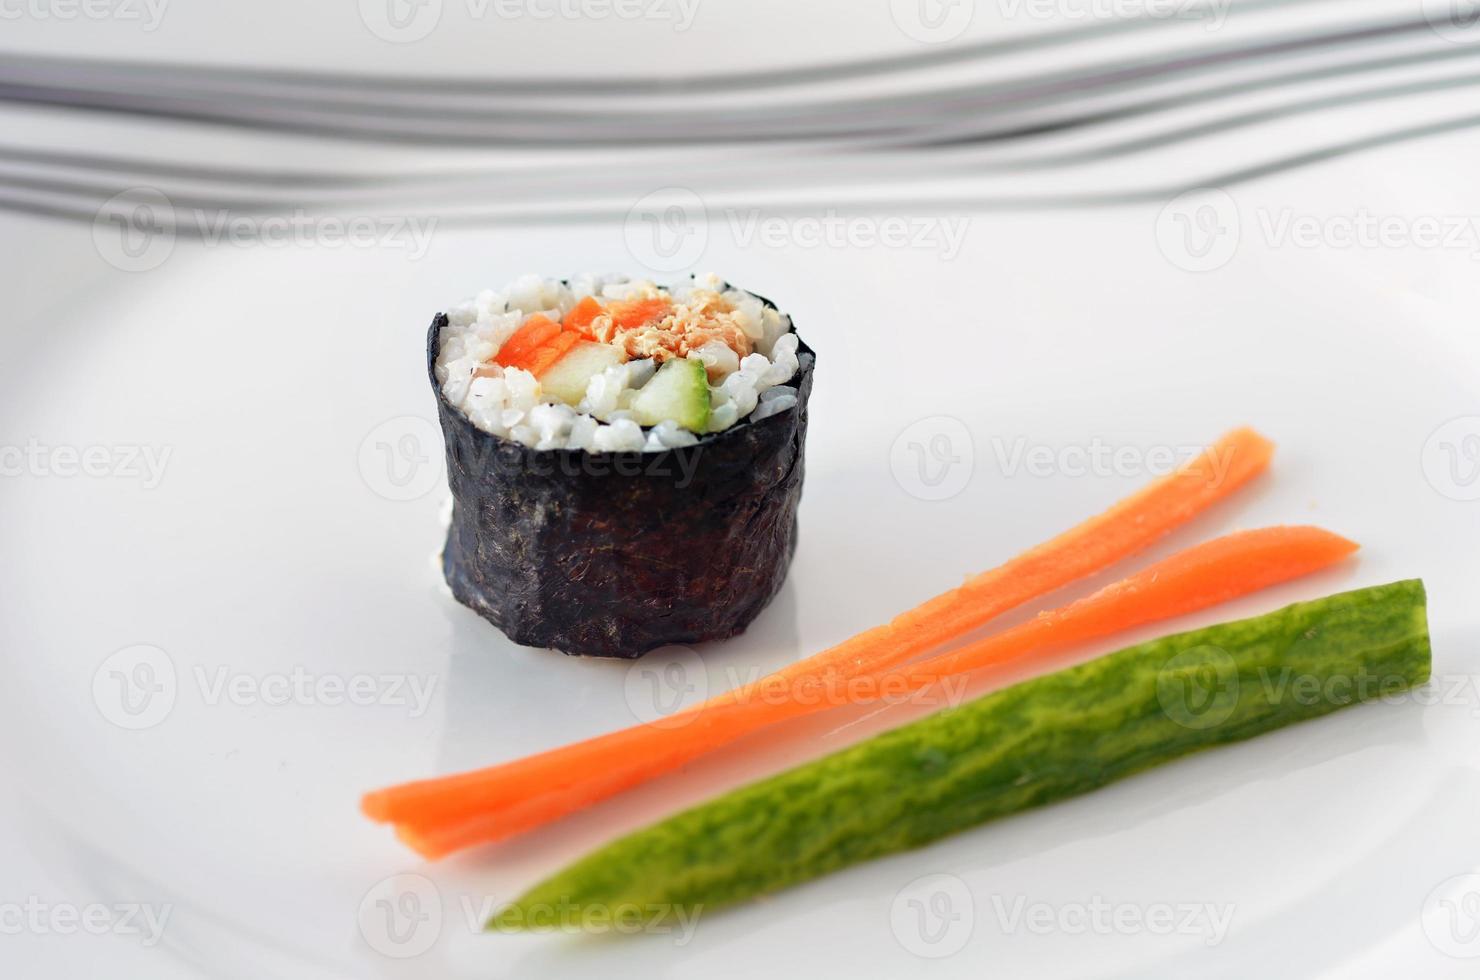 One Makizushi sushi fresh maki roll -Horizontal photo